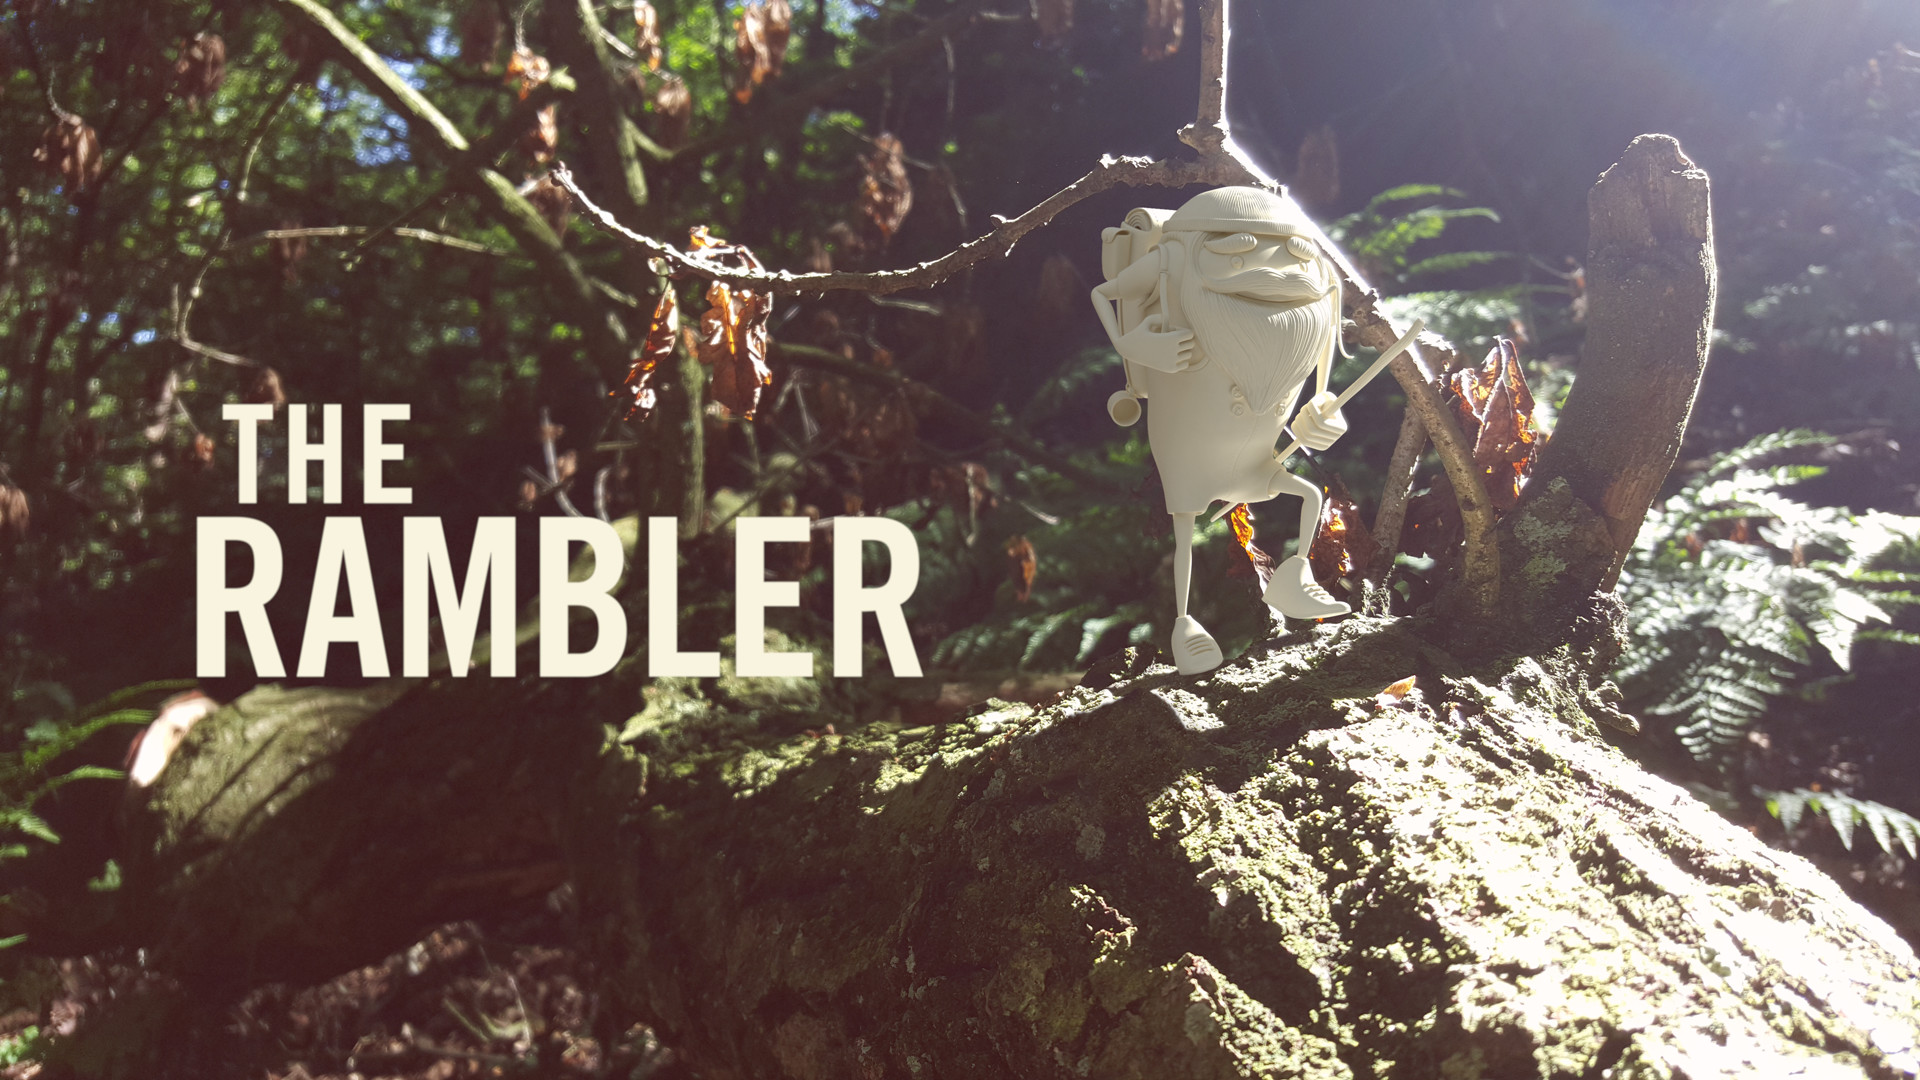 Chris schofield therambler 1920x1080